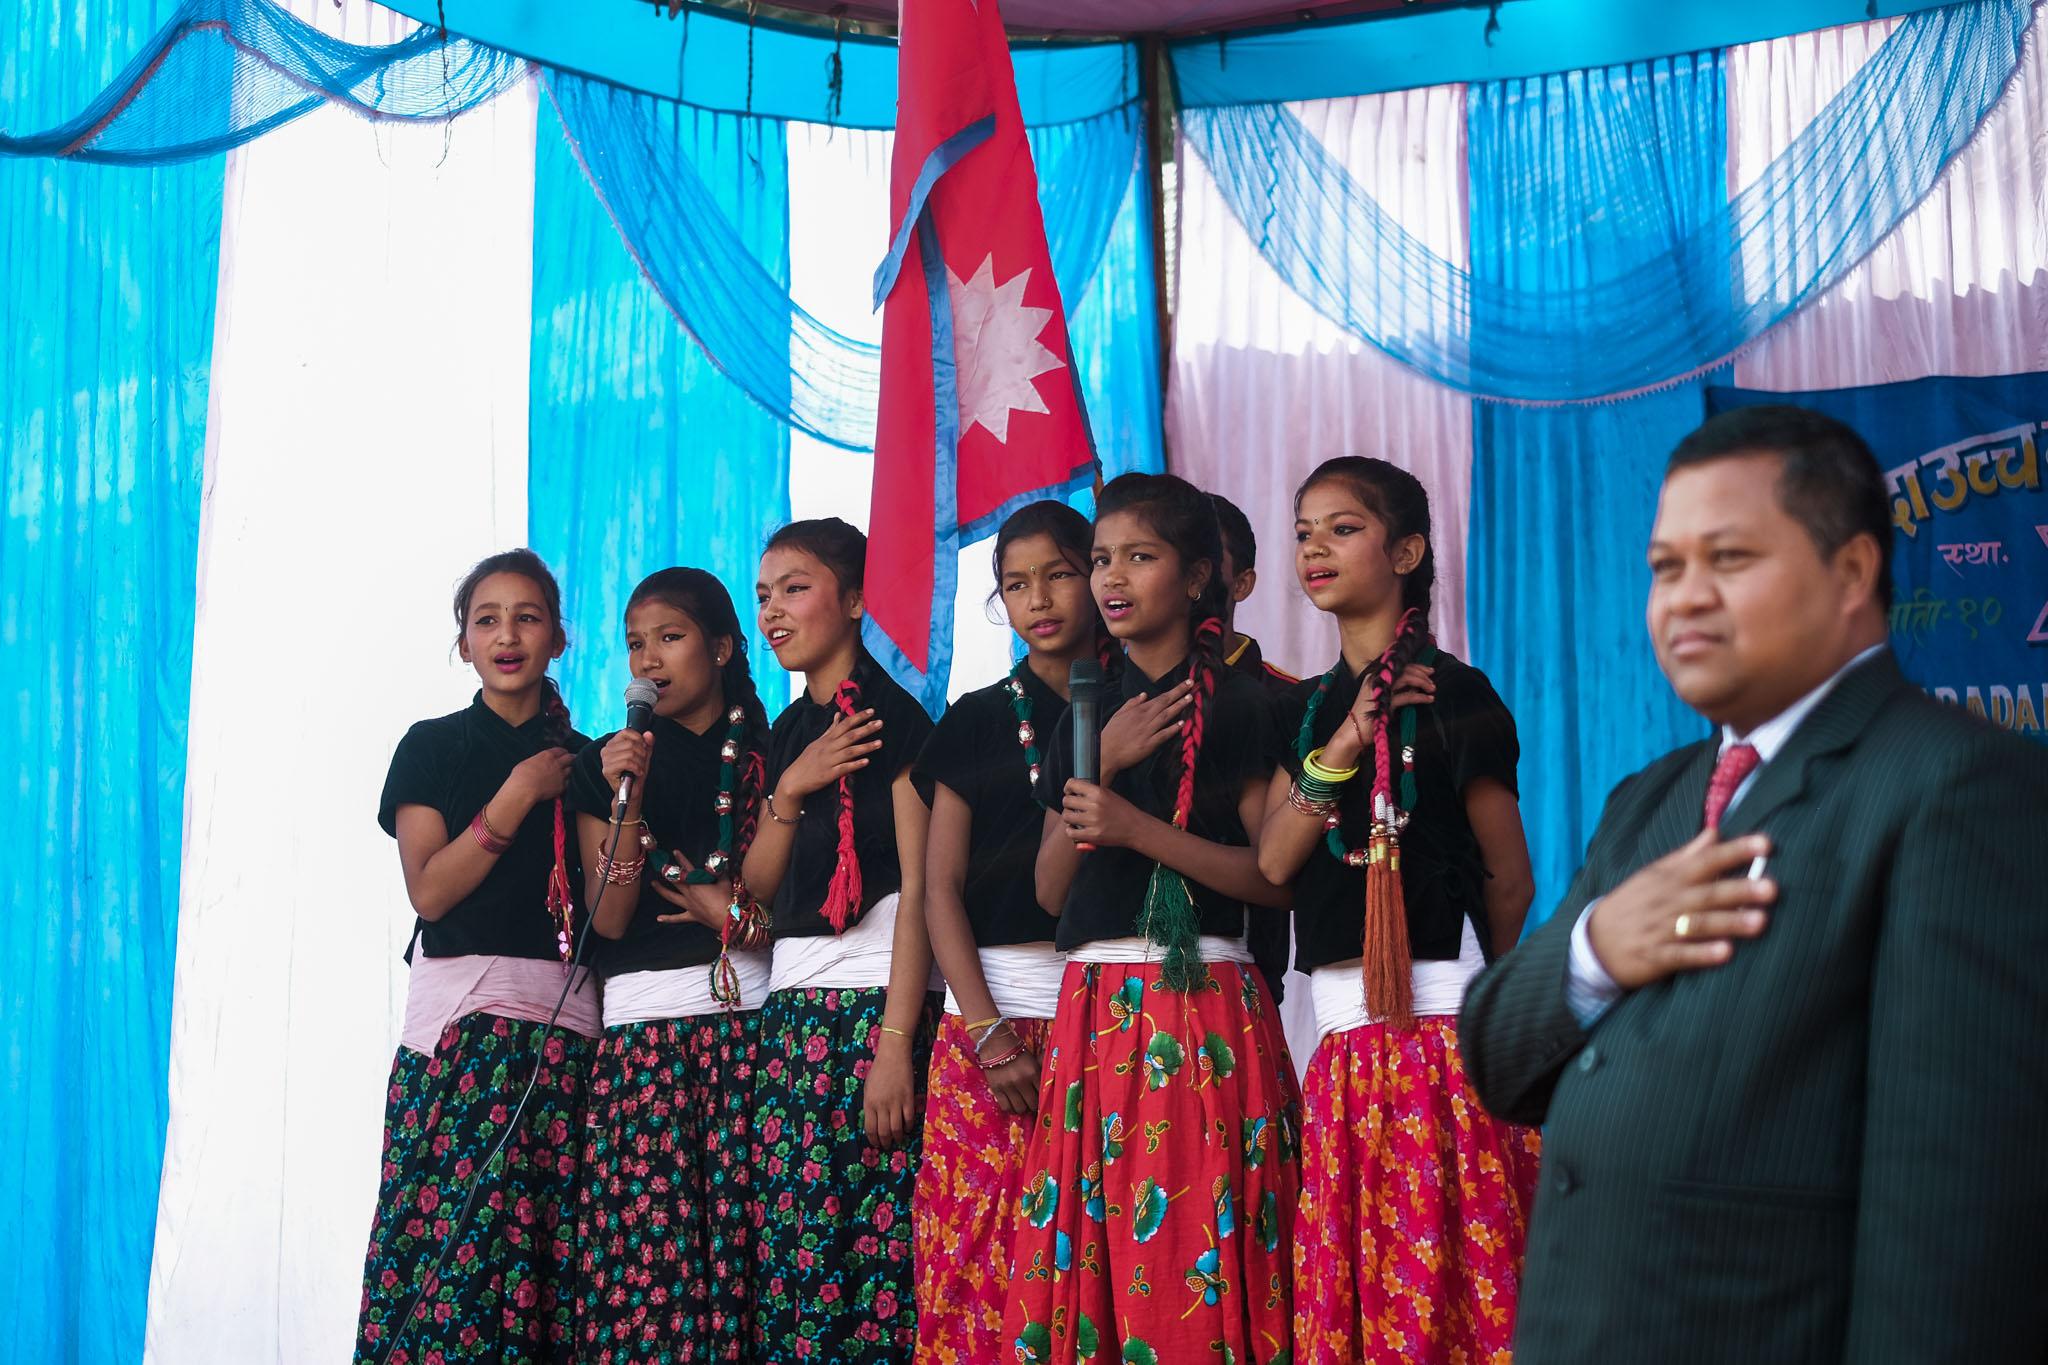 Singing the Napali national Anthem.